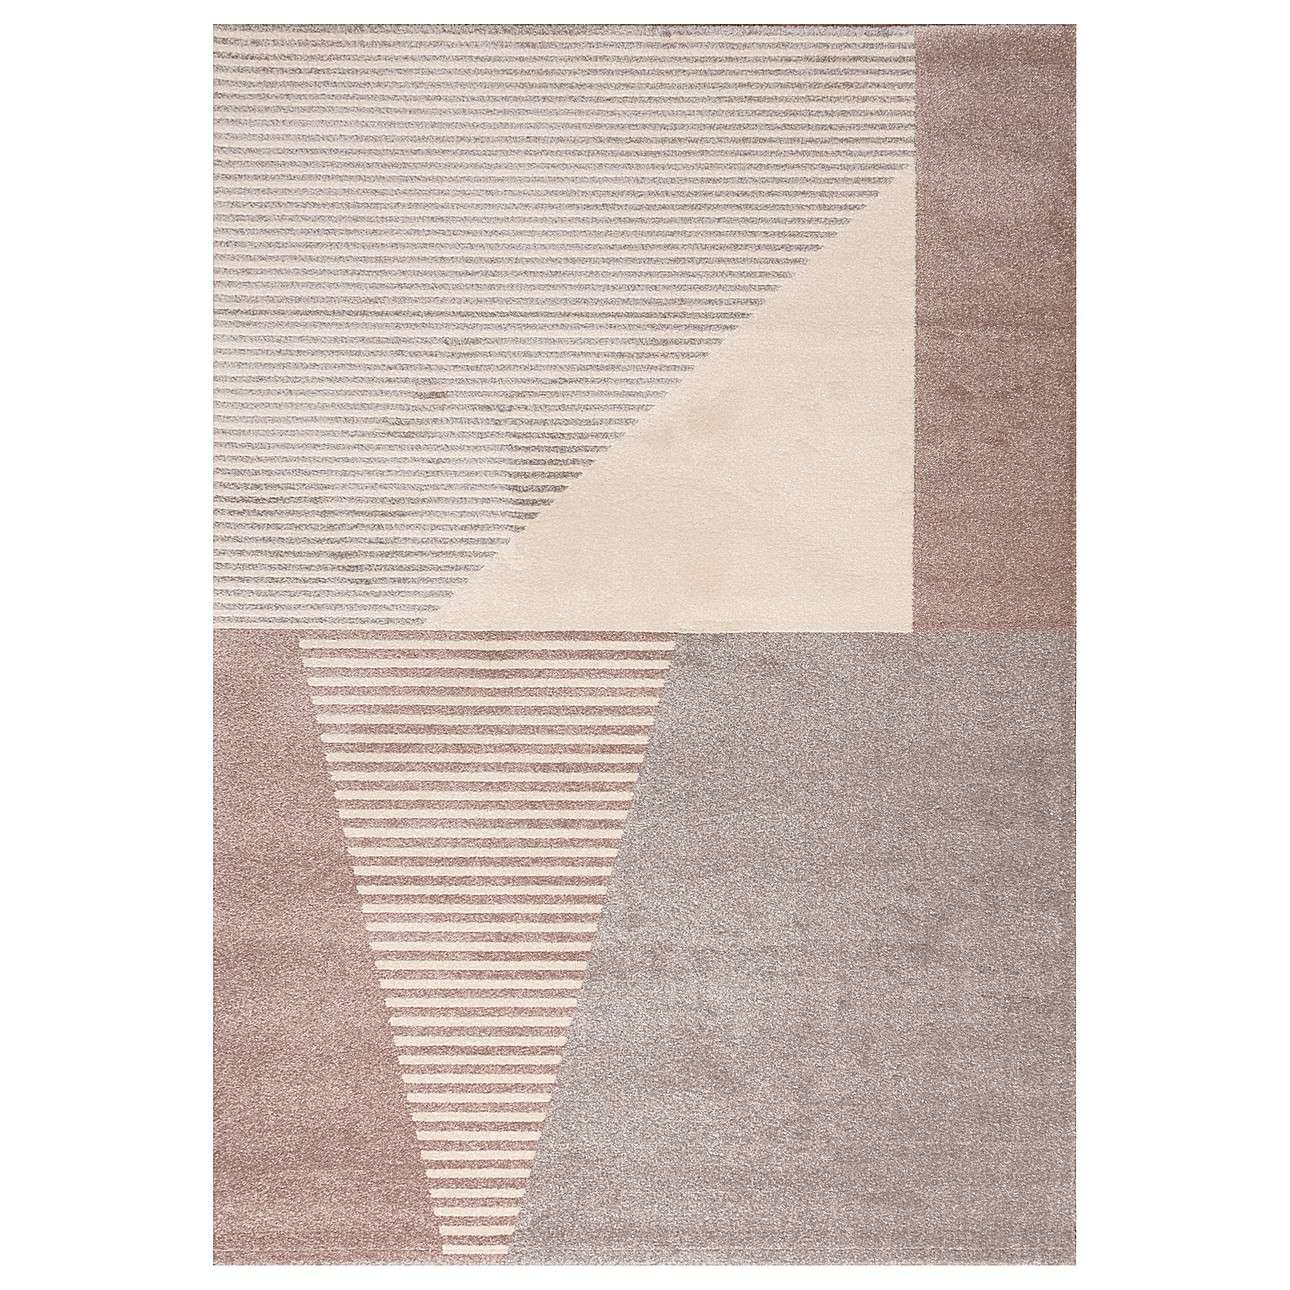 Koberec Sevilla paper white/dusty rose 160x230cm